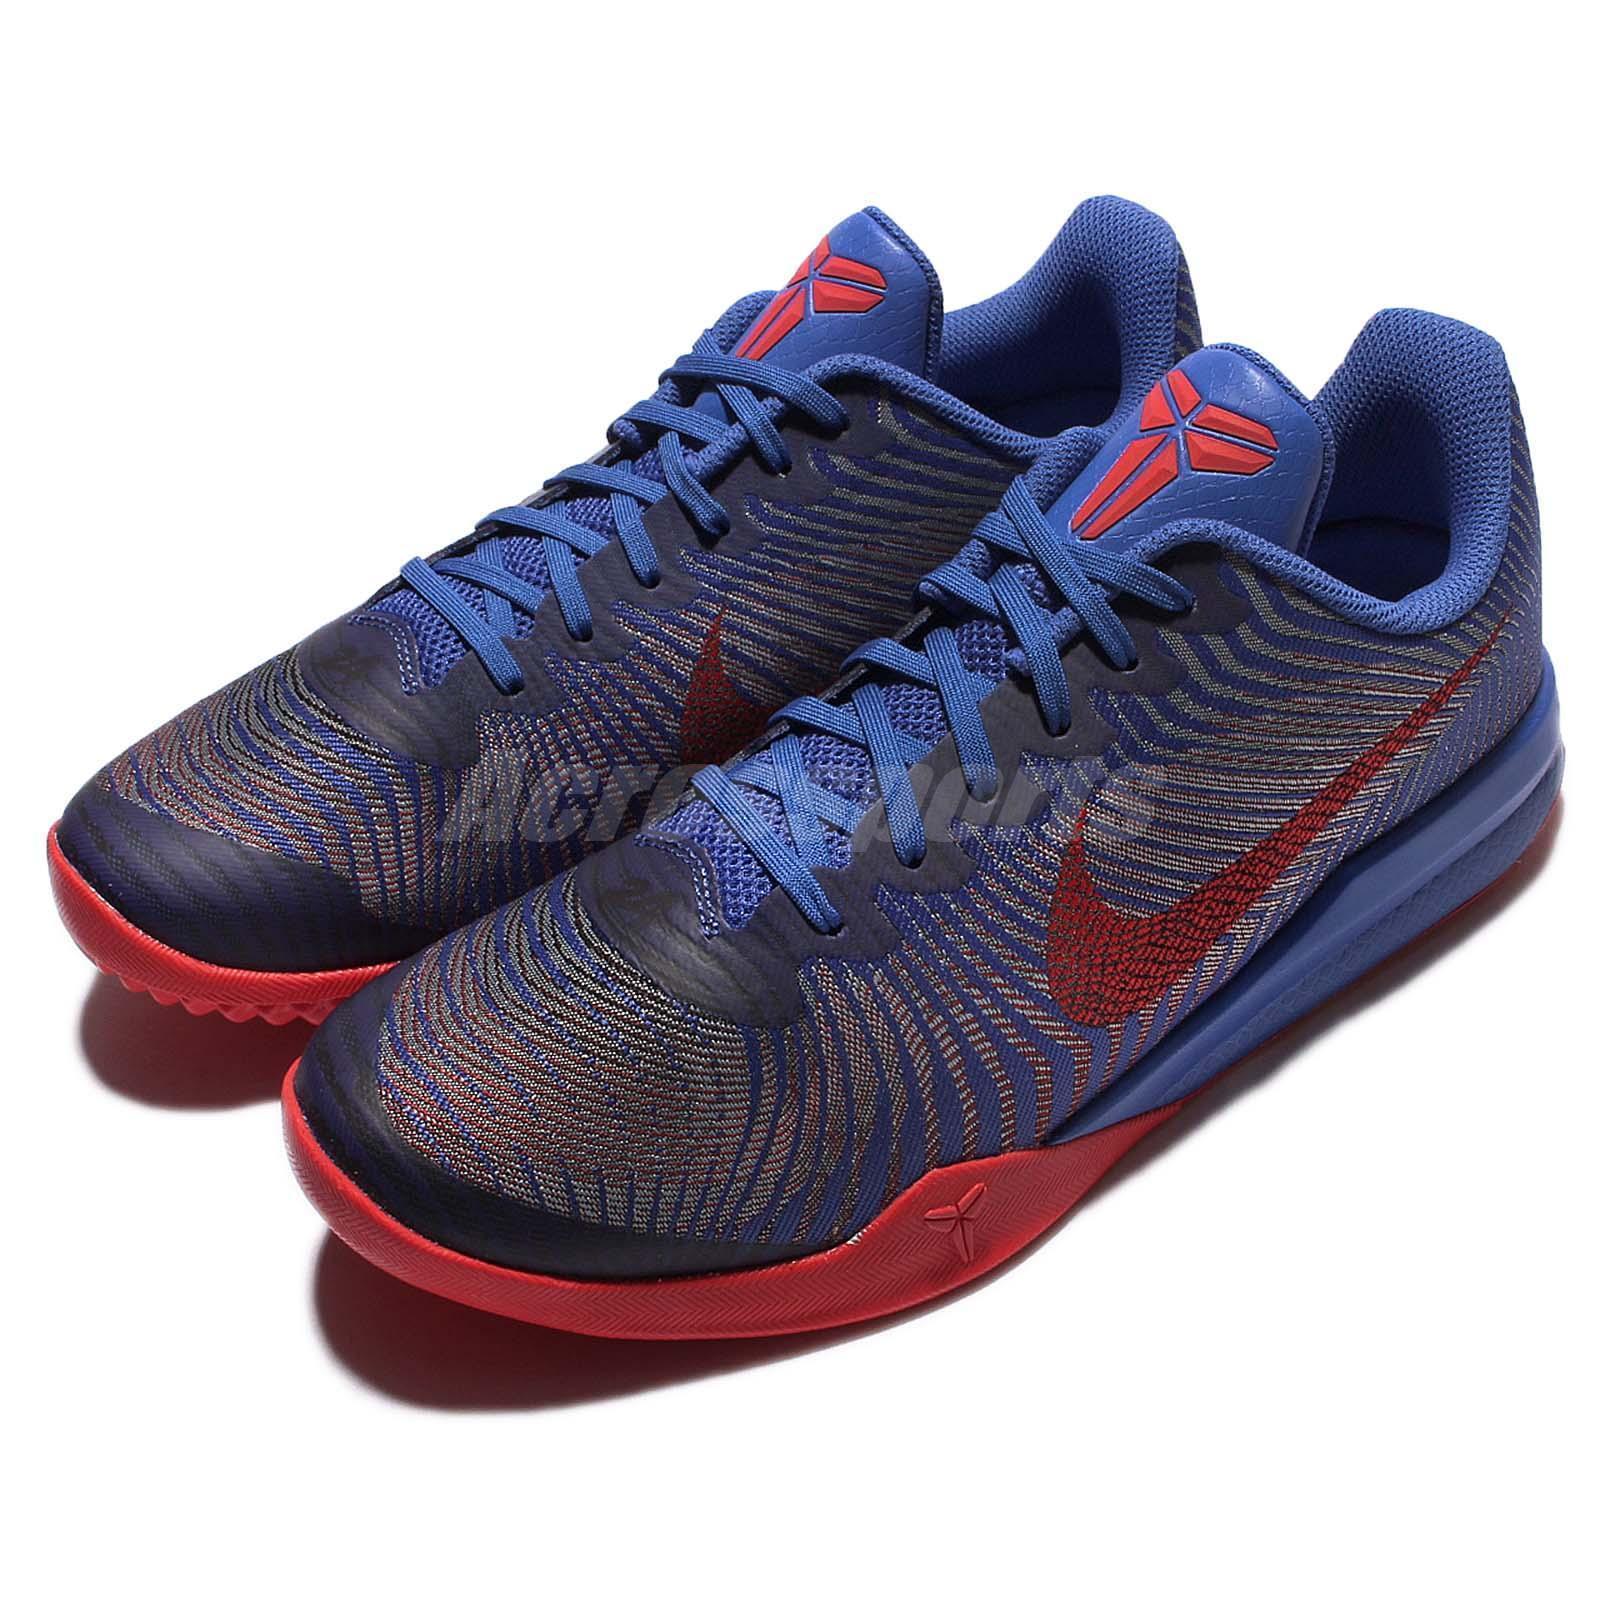 f6fc107e7a1f Nike KB Mentality II EP Kobe Bryant Blue Red Mens Basketball Shoes  818953-402 on